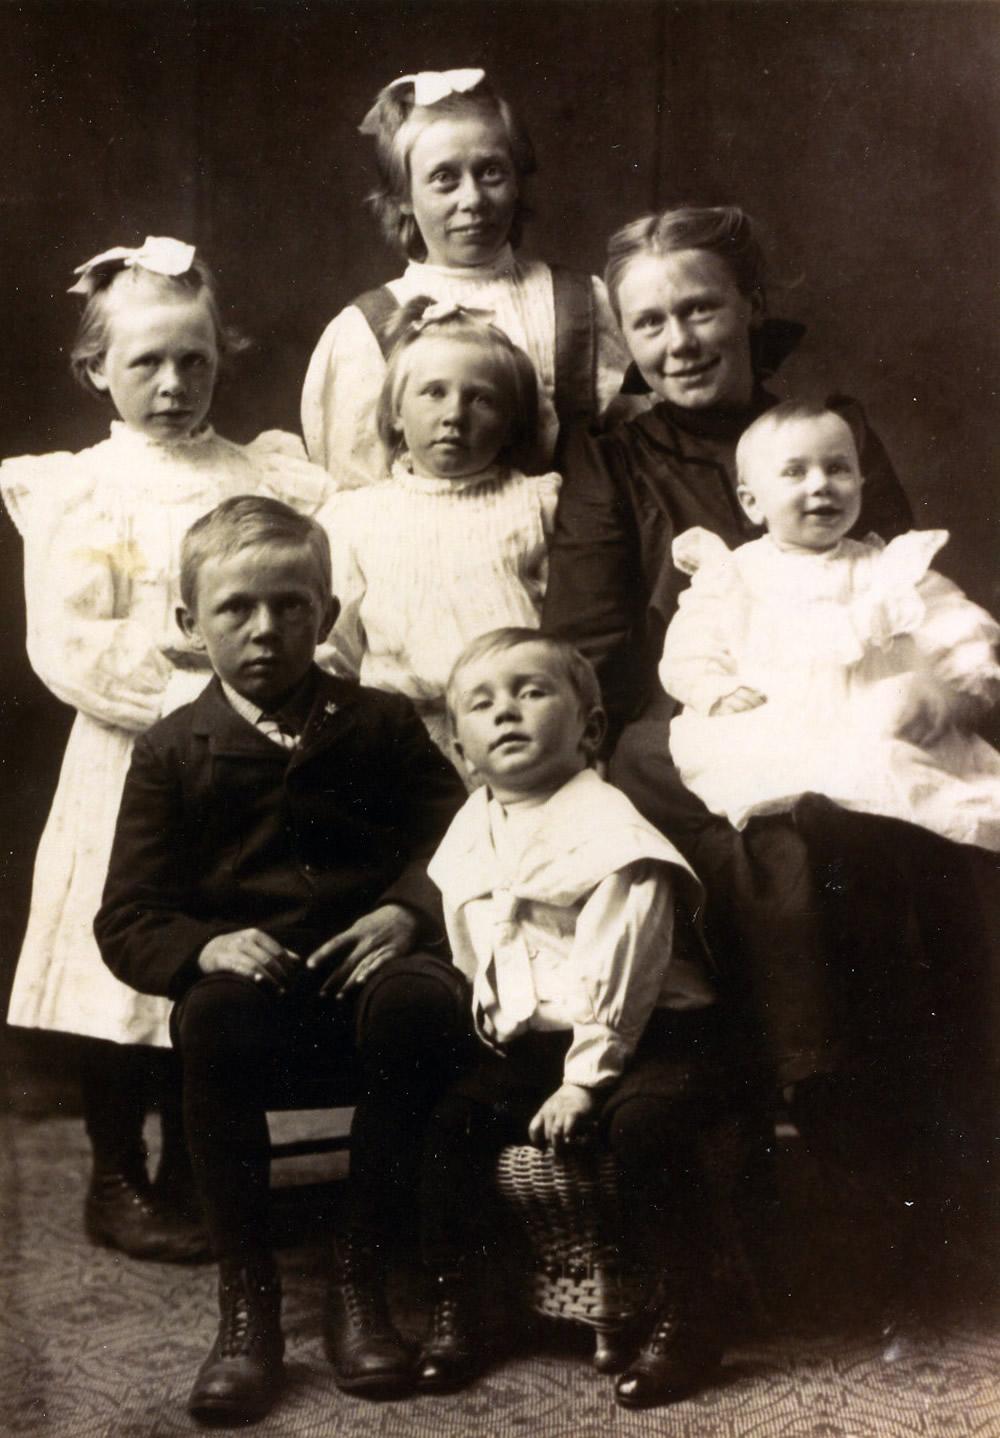 Children of Peter Stoltz II (1862-1948) and Winifred Rusch (1874-1933)